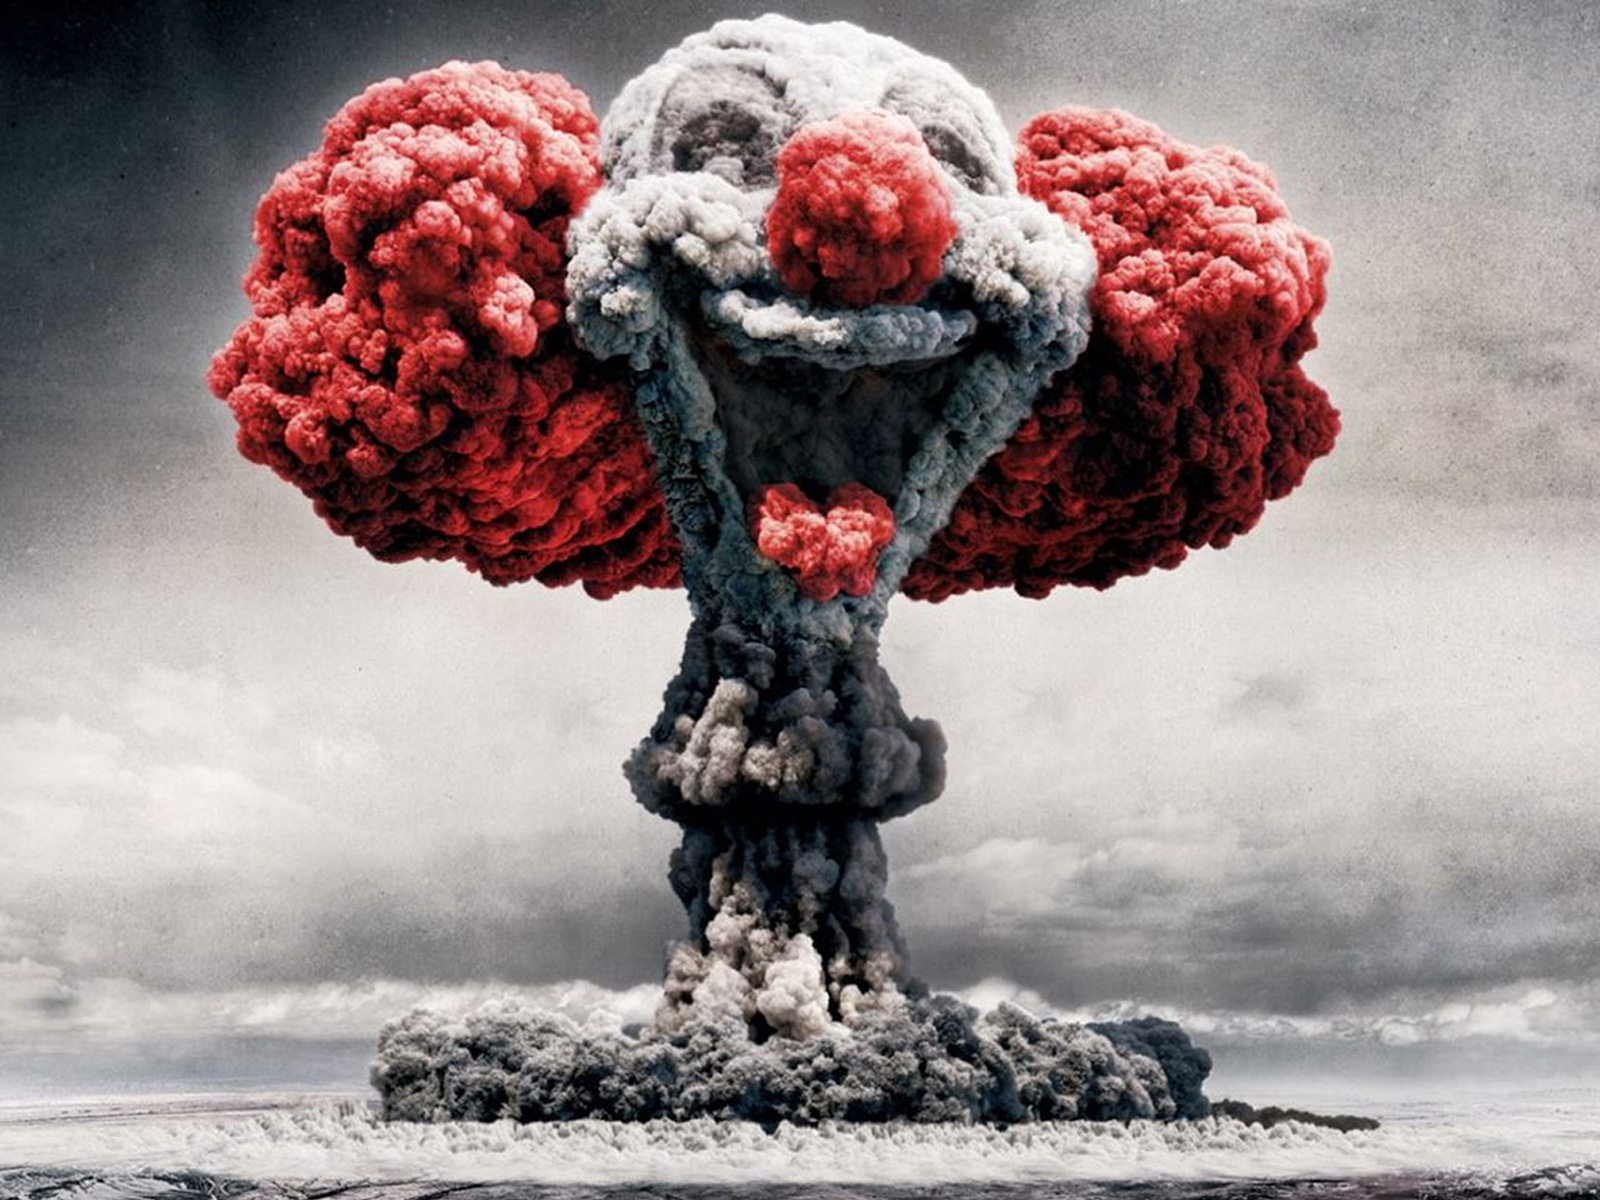 atomic-clown-explosion.jpg